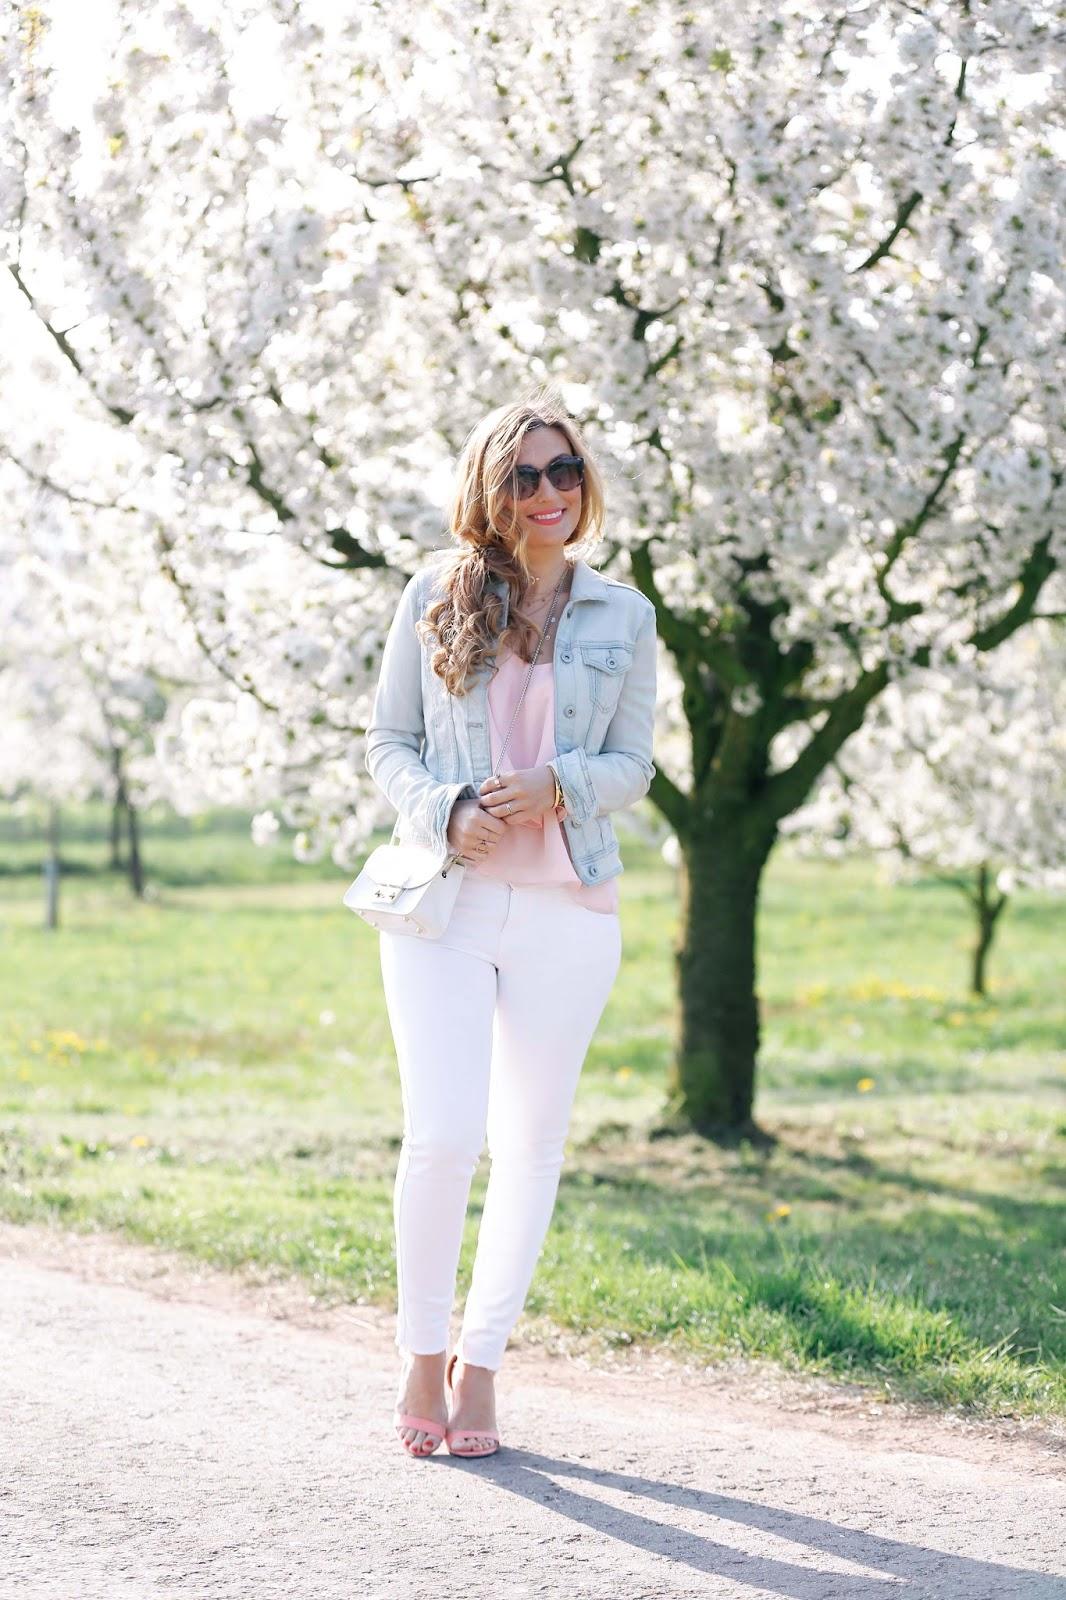 blogger-style-weiße-jeans-rosa-sandalen-blogger-sommerlook-Fashionstylebyjohanna